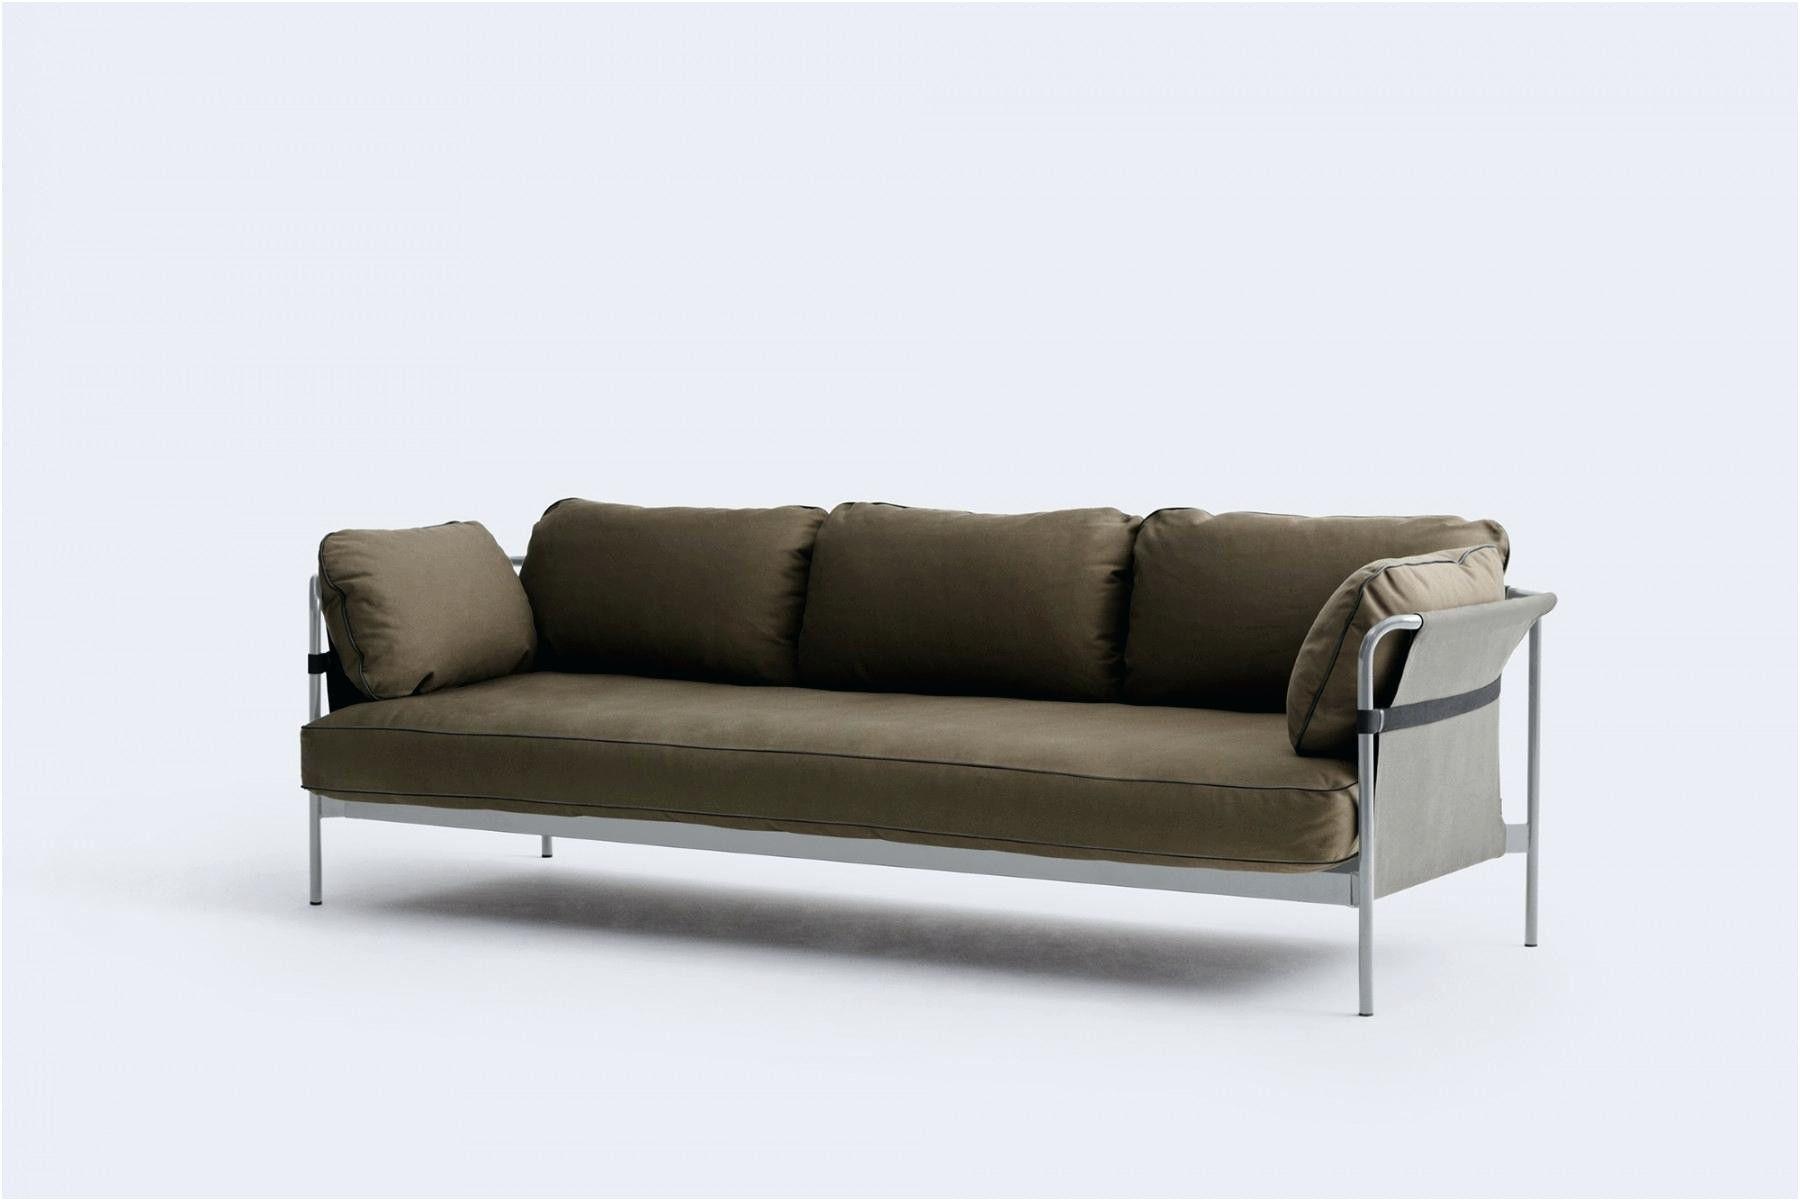 Verschiedenes Big Sofa Ecke In 2020 Big Sofas Big Couch Sofa